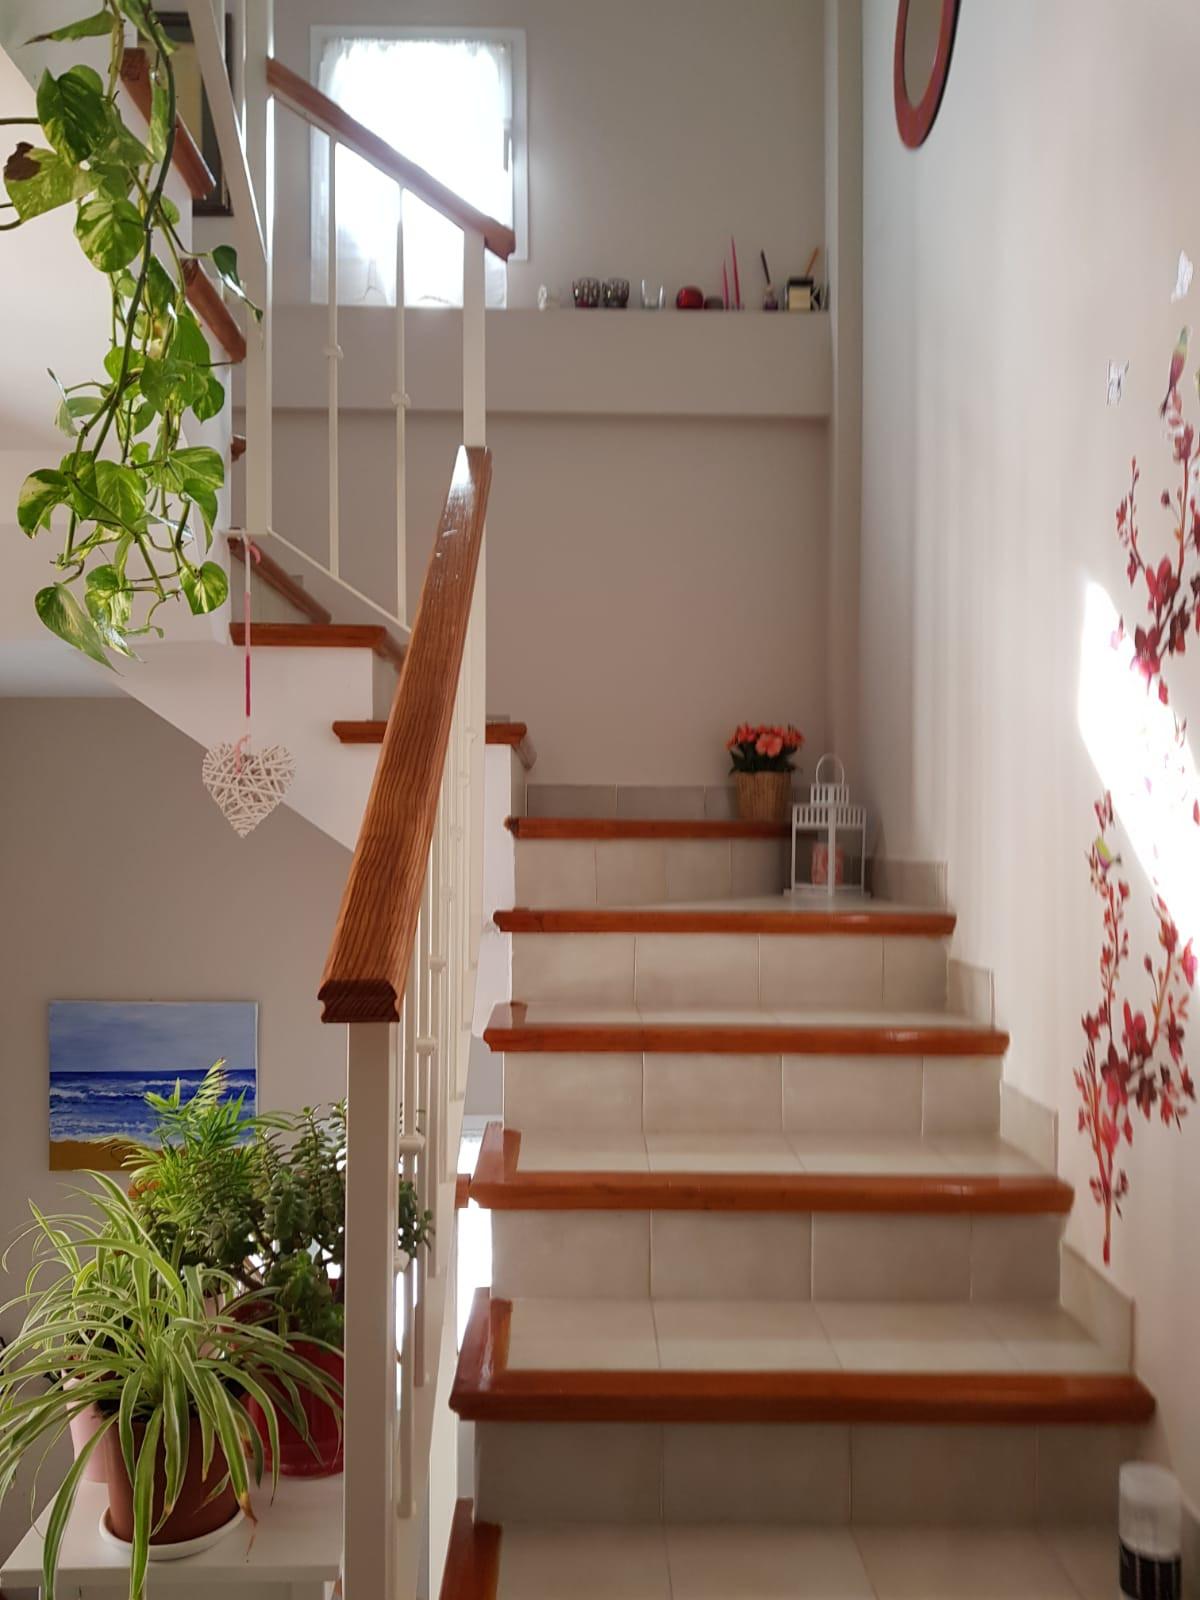 Cozy terraced house with 3 bedrooms, 2 bathrooms (1 en suite) 1 toilet, living room, kitchen, very c,Spain